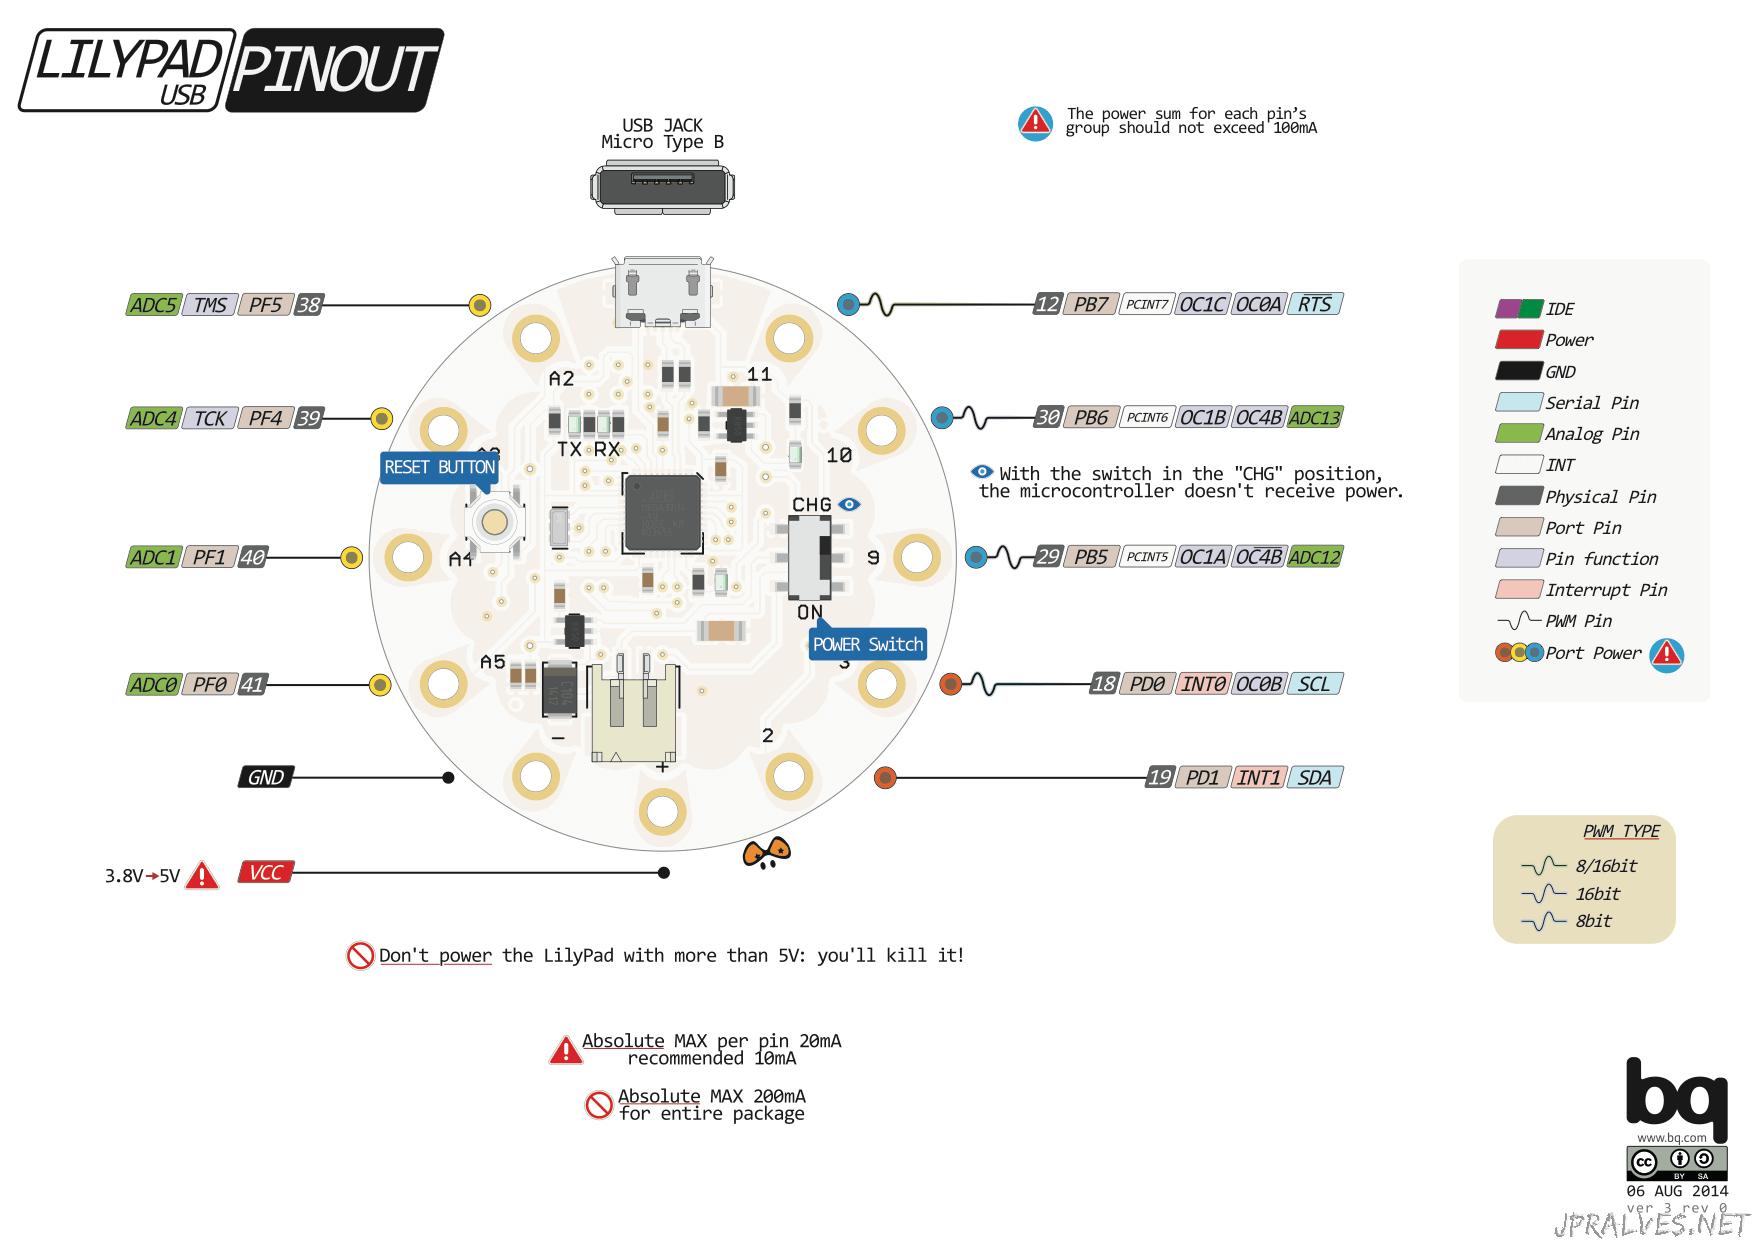 pinout_42.png